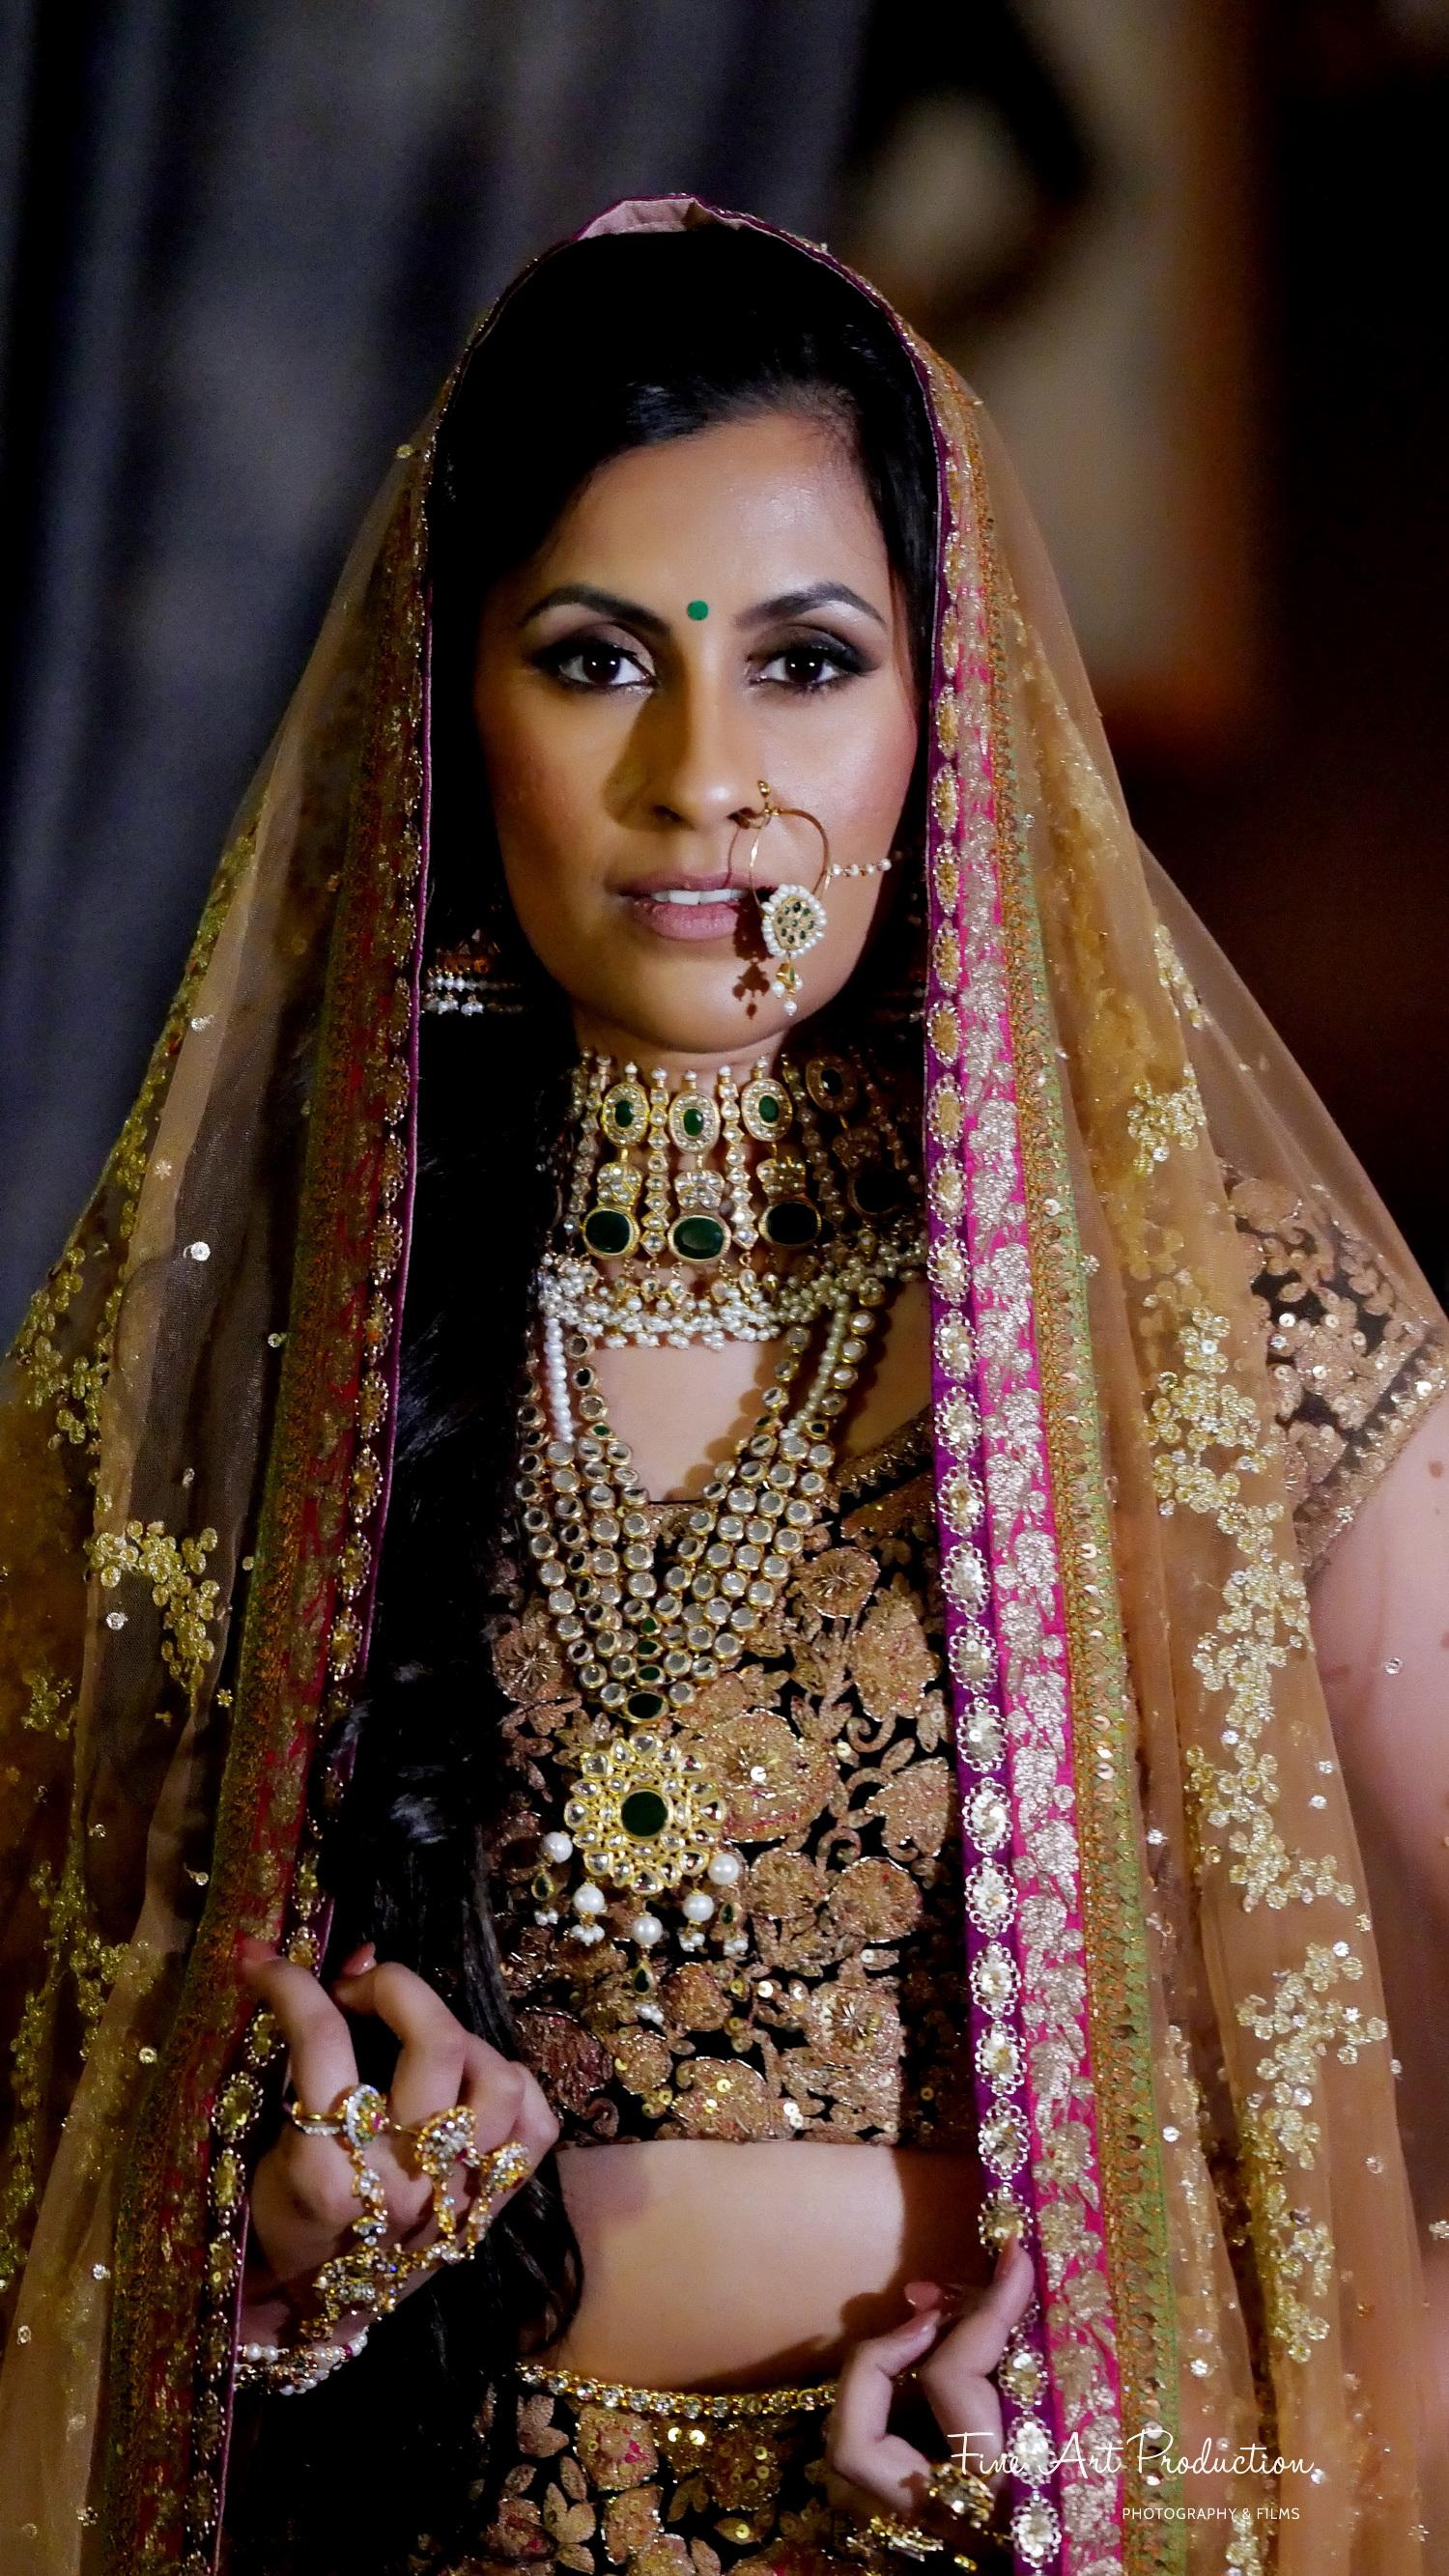 india-wedding-photographer-fine-art-production-chirali-amish-thakkar_0128